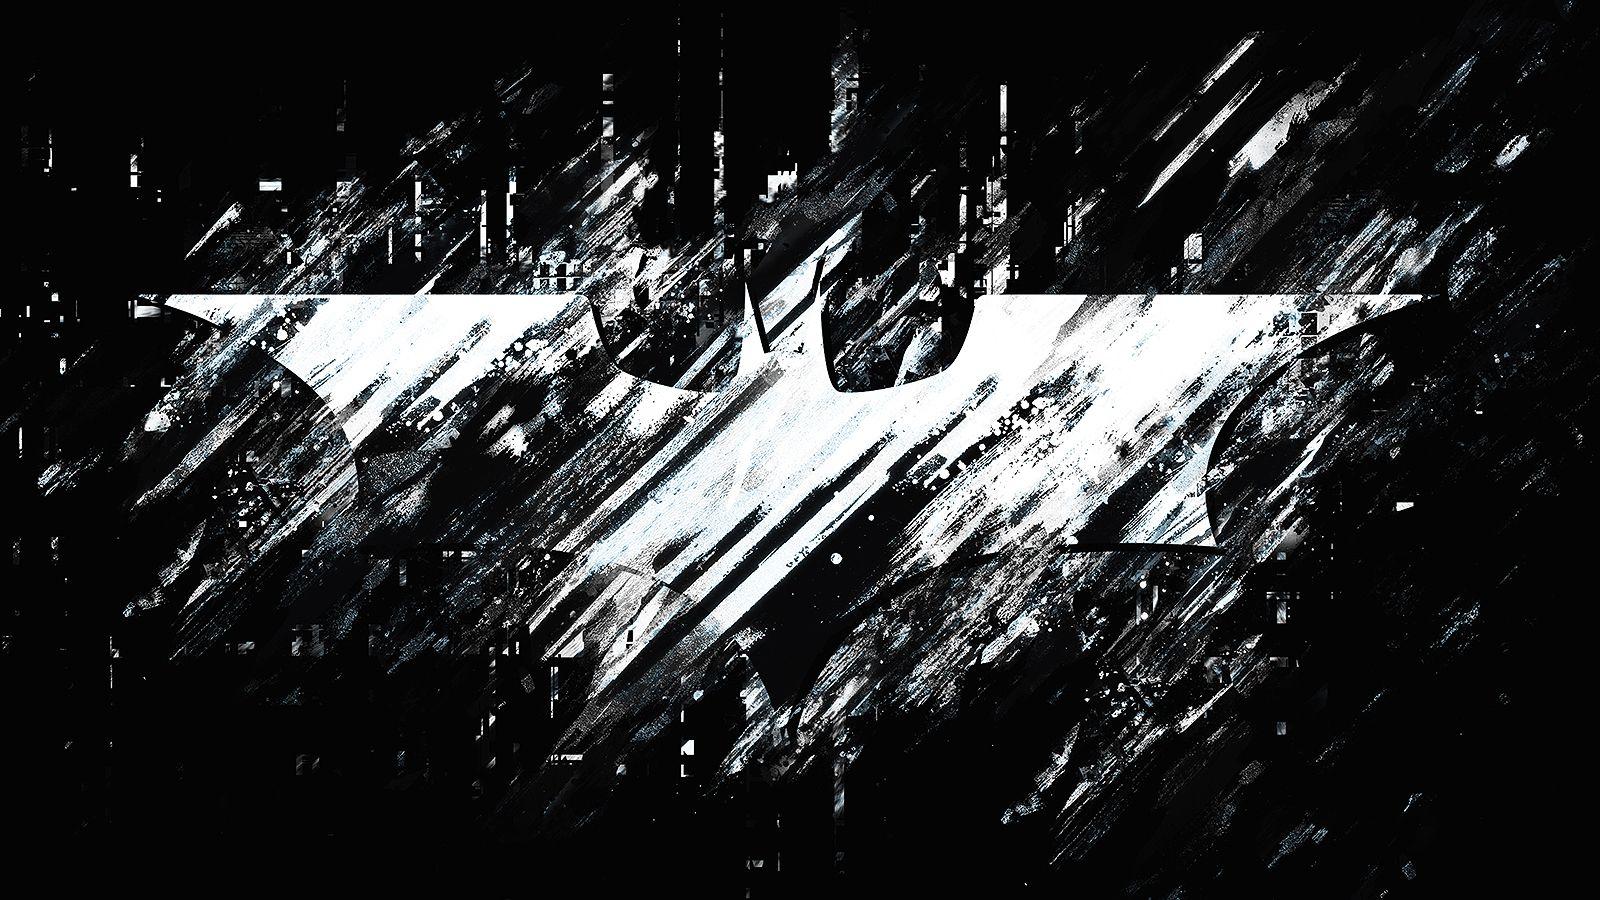 Pdo Batman The Dark Knight Wallpaper High Definition 1920 1080